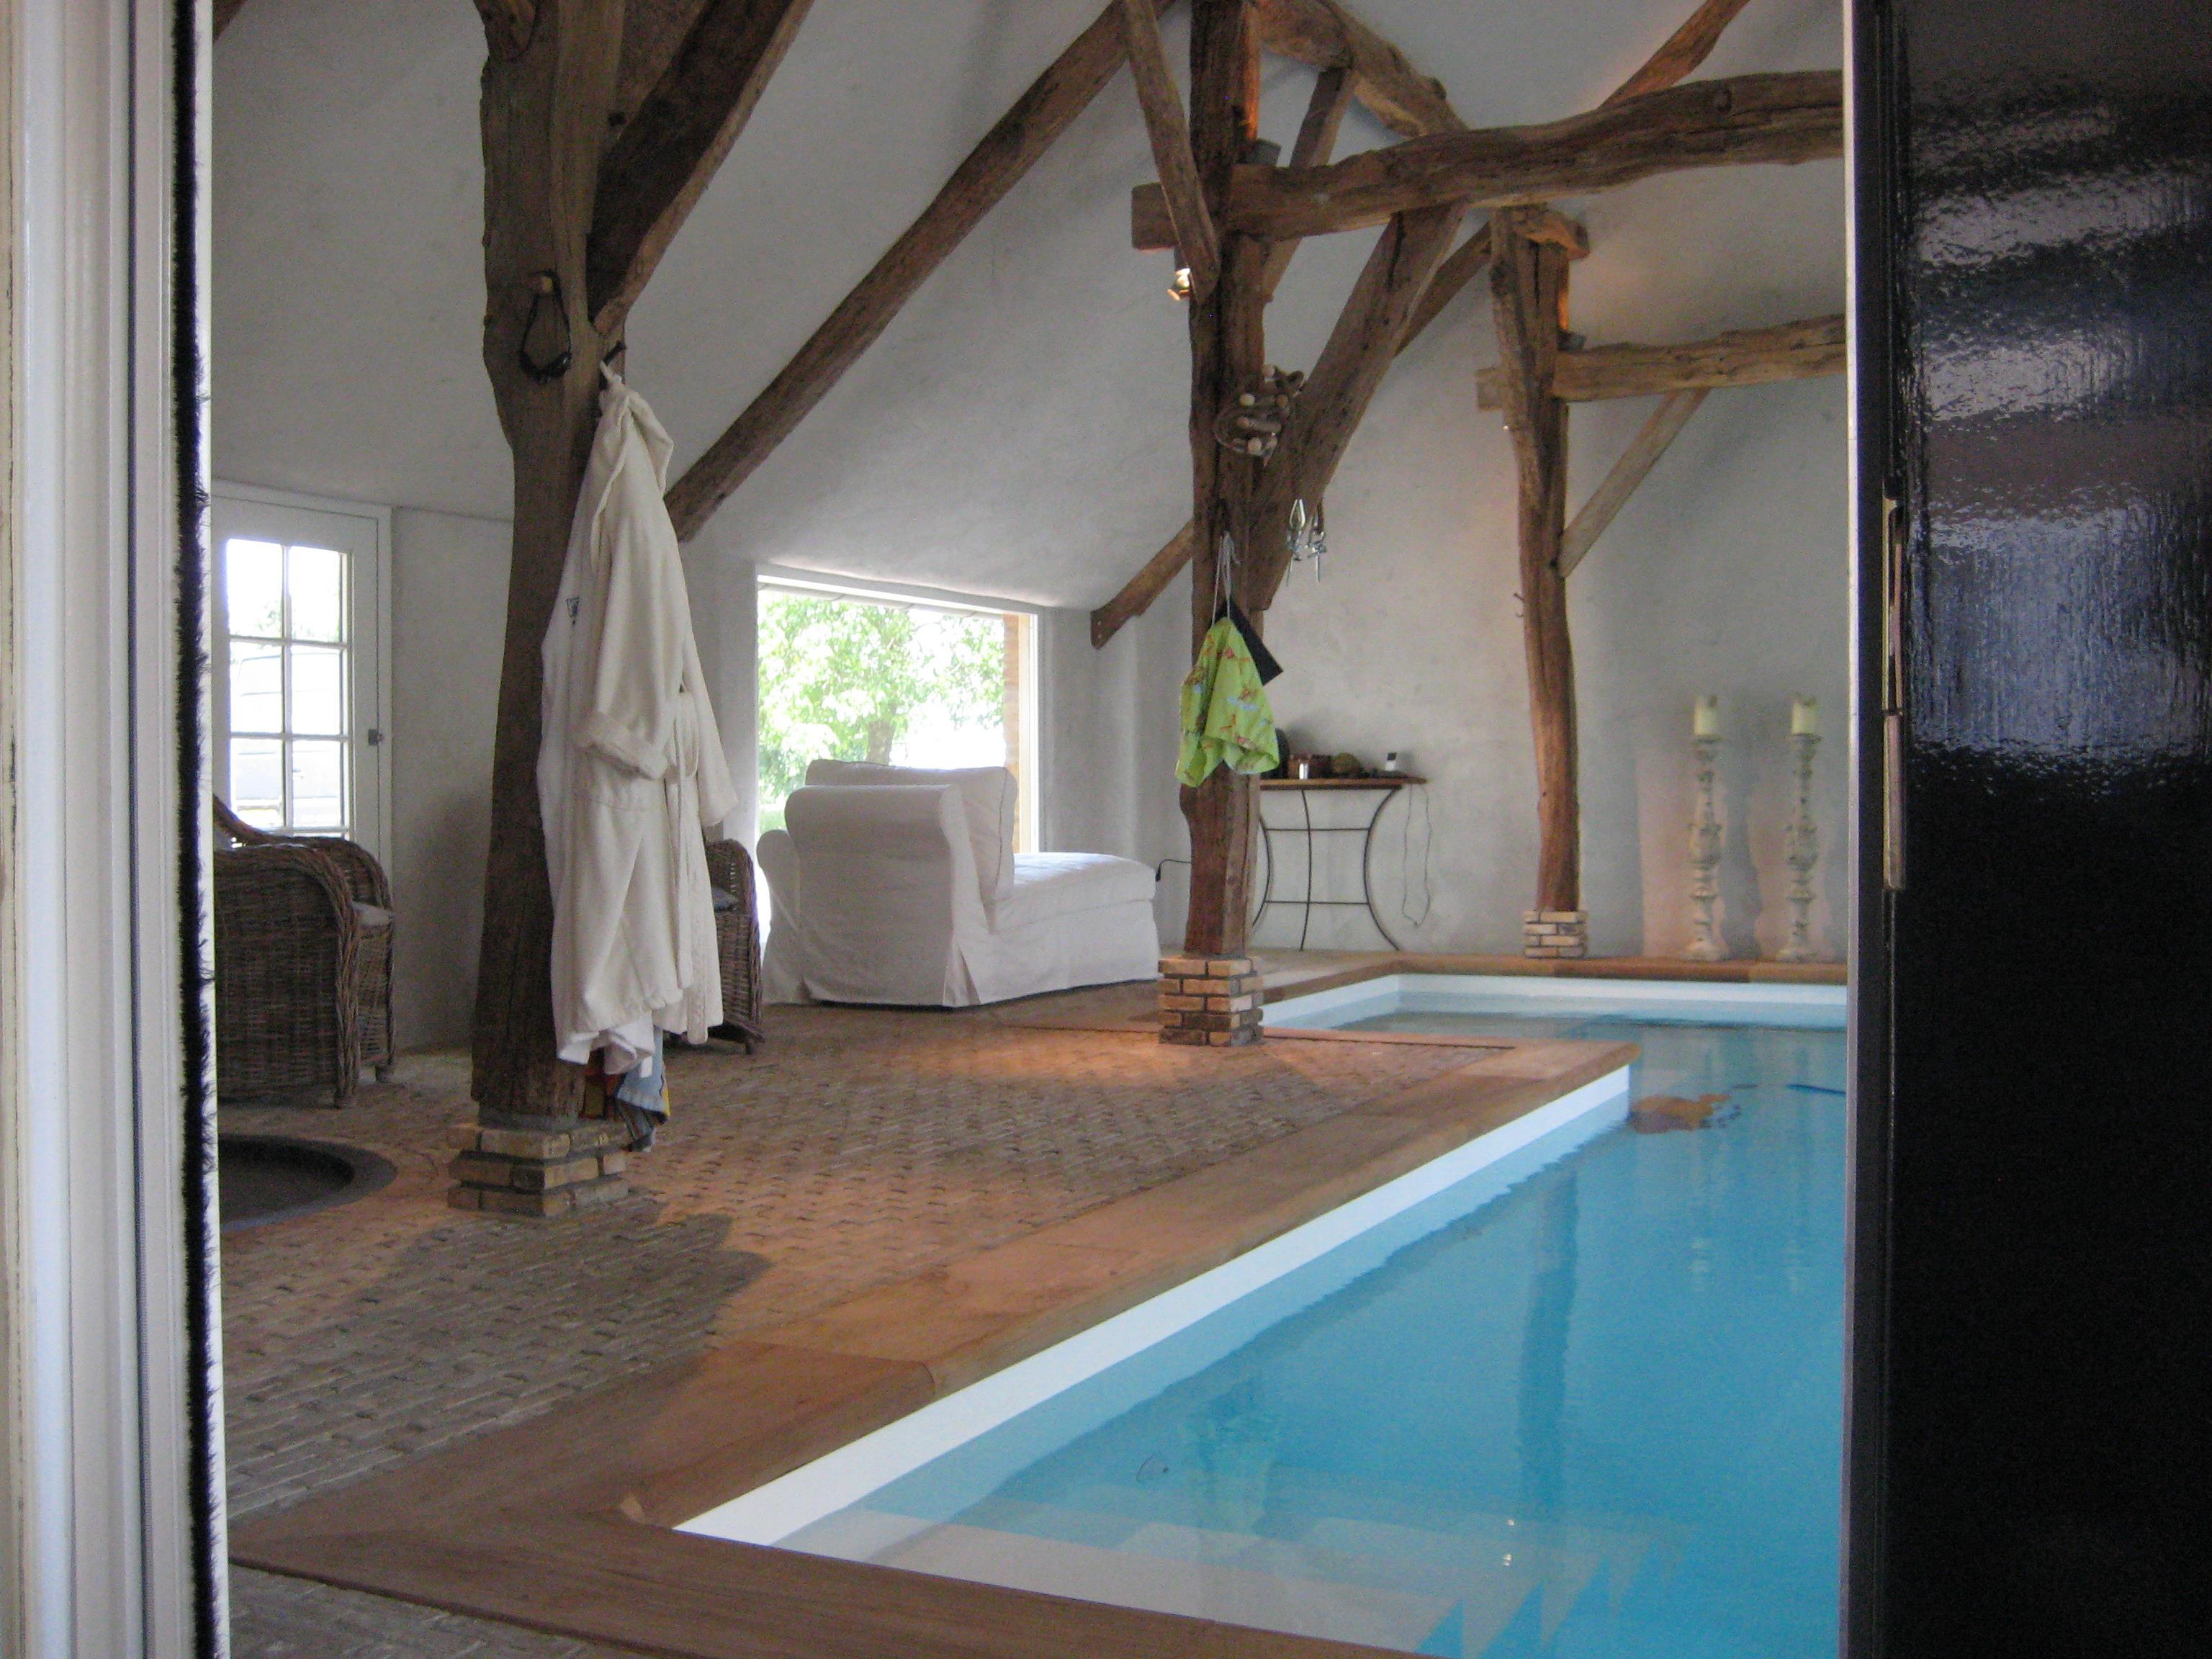 Zwembad schuur u2013 architectenbureau drijvers oisterwijk b.v.